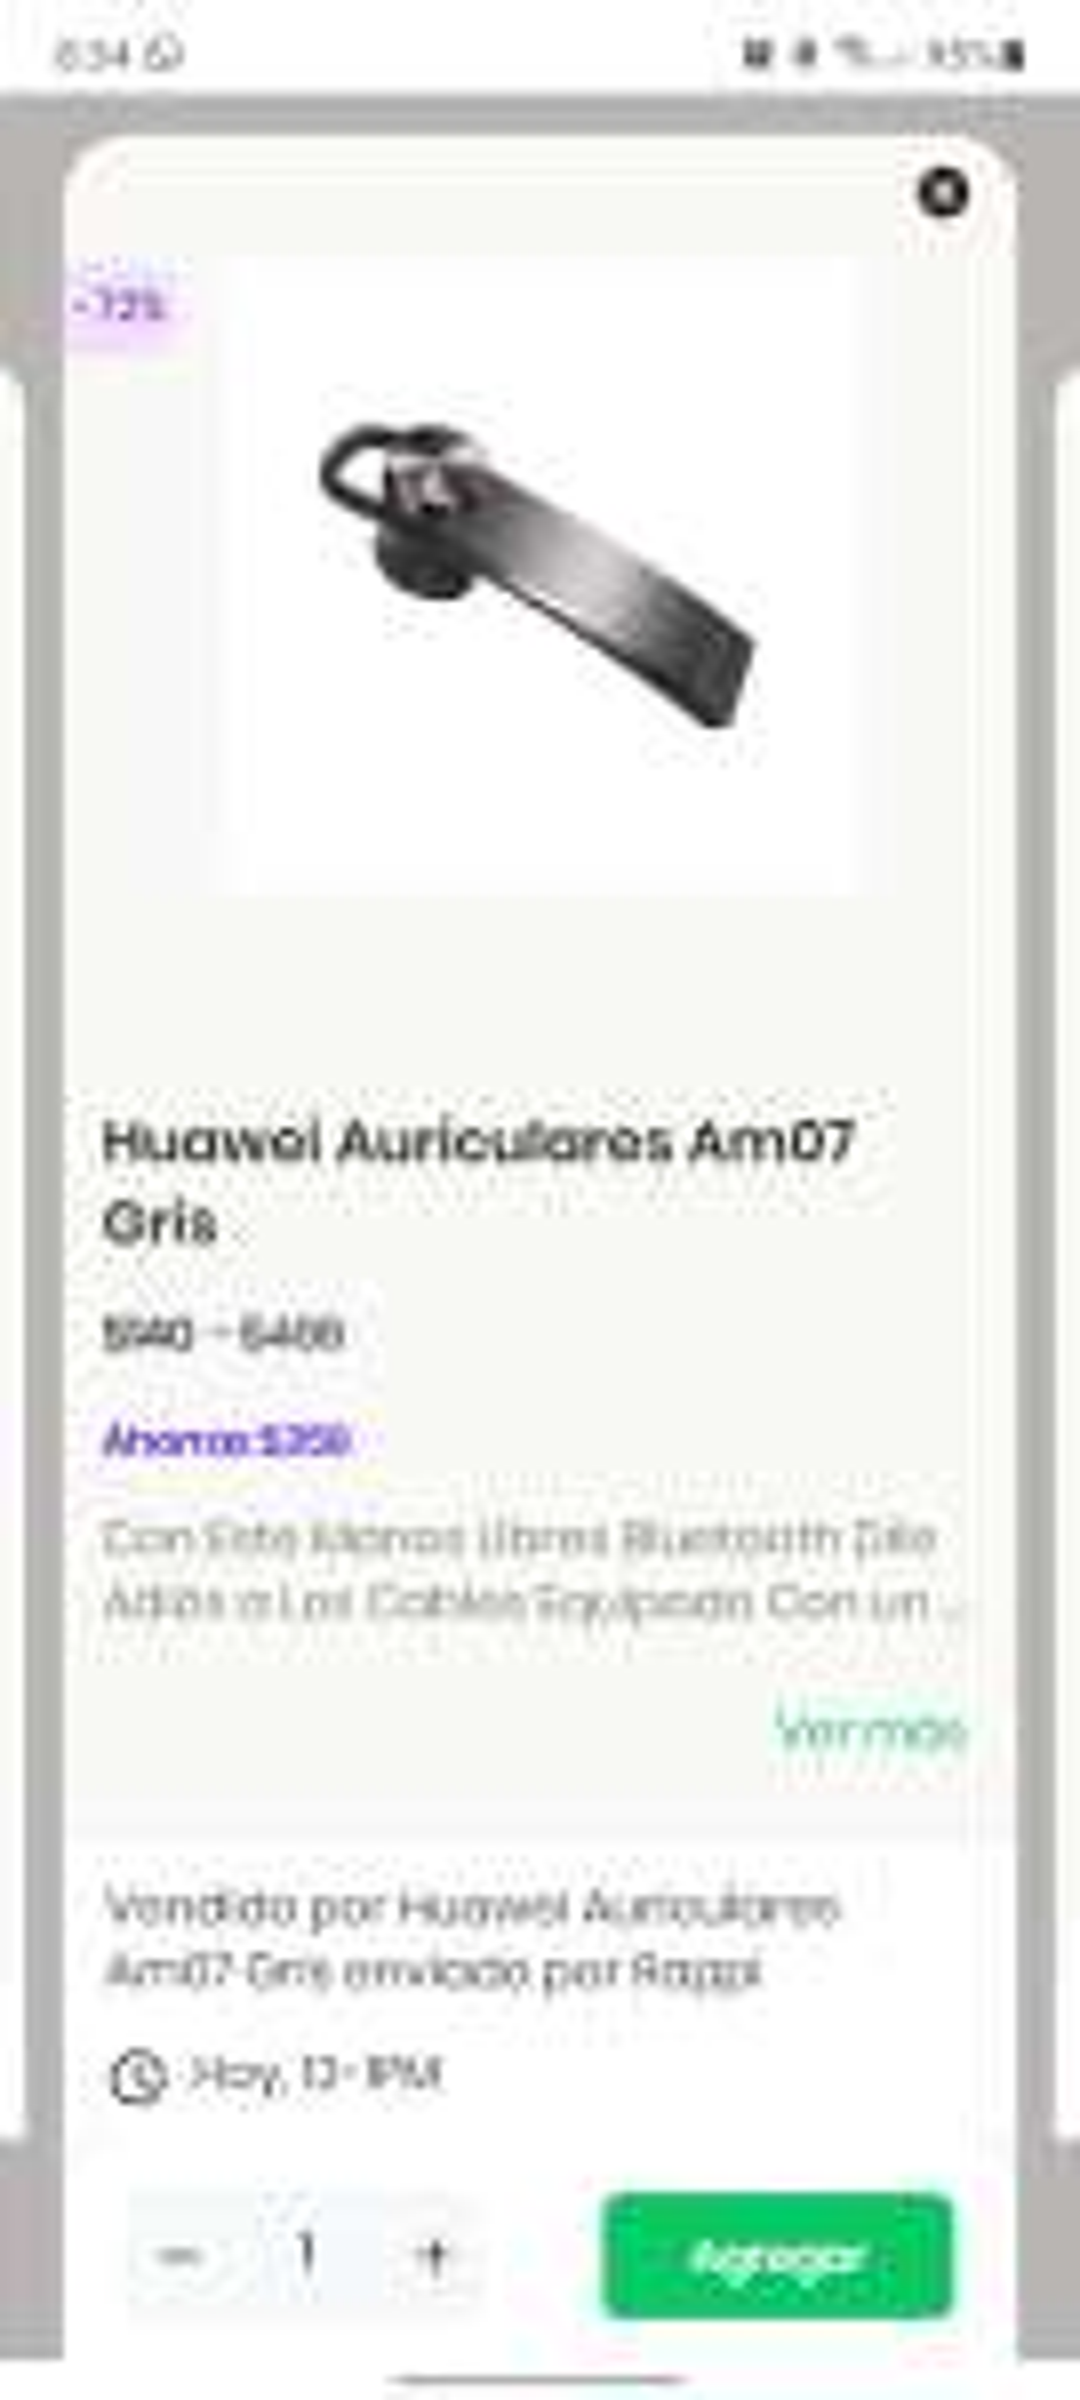 Rappi: Huawei Auricular AM07